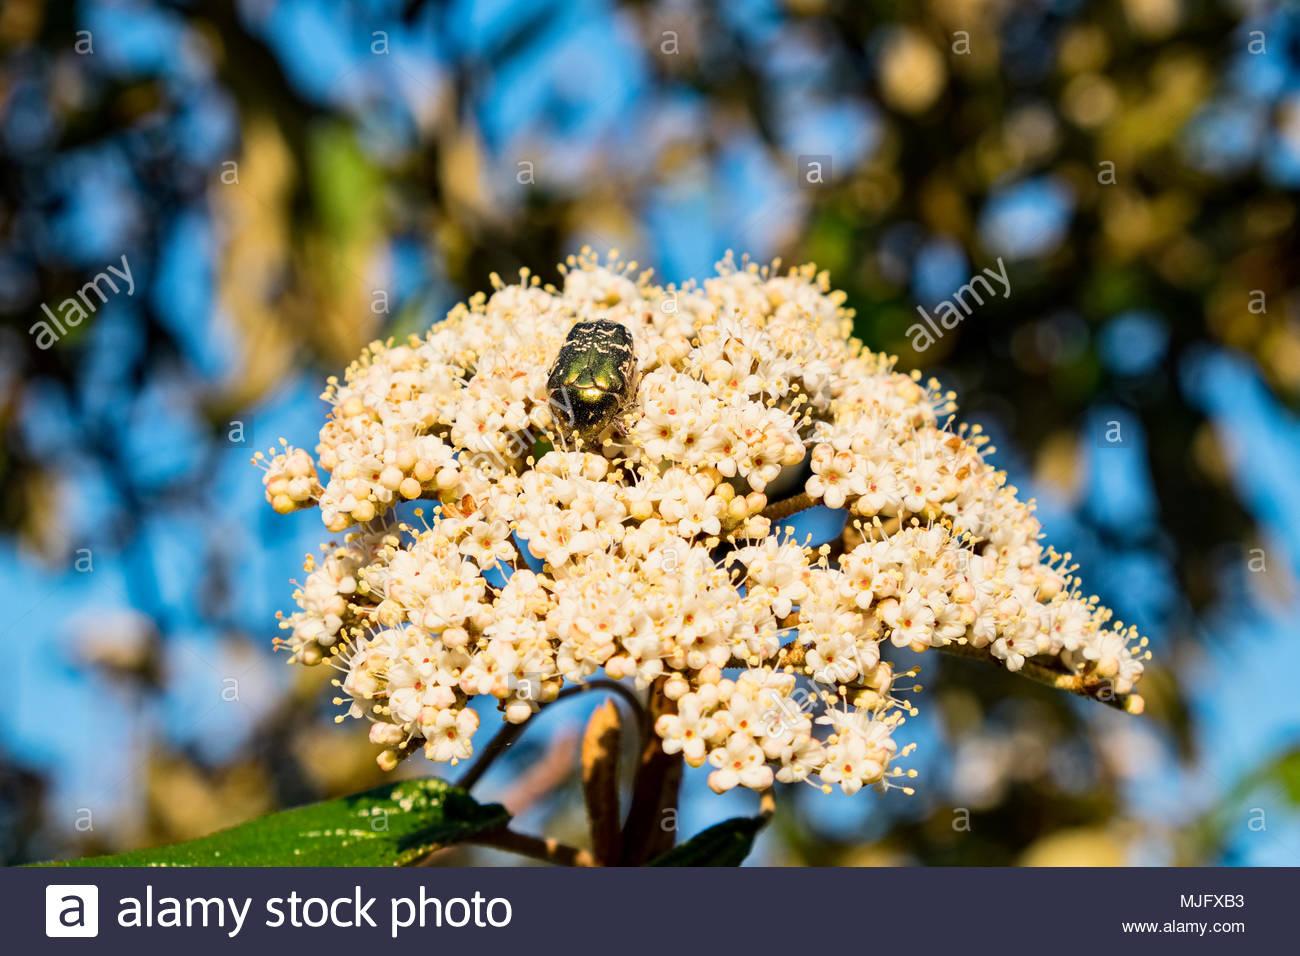 Cetonia aurata beetle feasts on freshly opened flowers of Viburnum rhytidophyllum, an evergreen shrub commonly called leatherleaf virbunum. - Stock Image